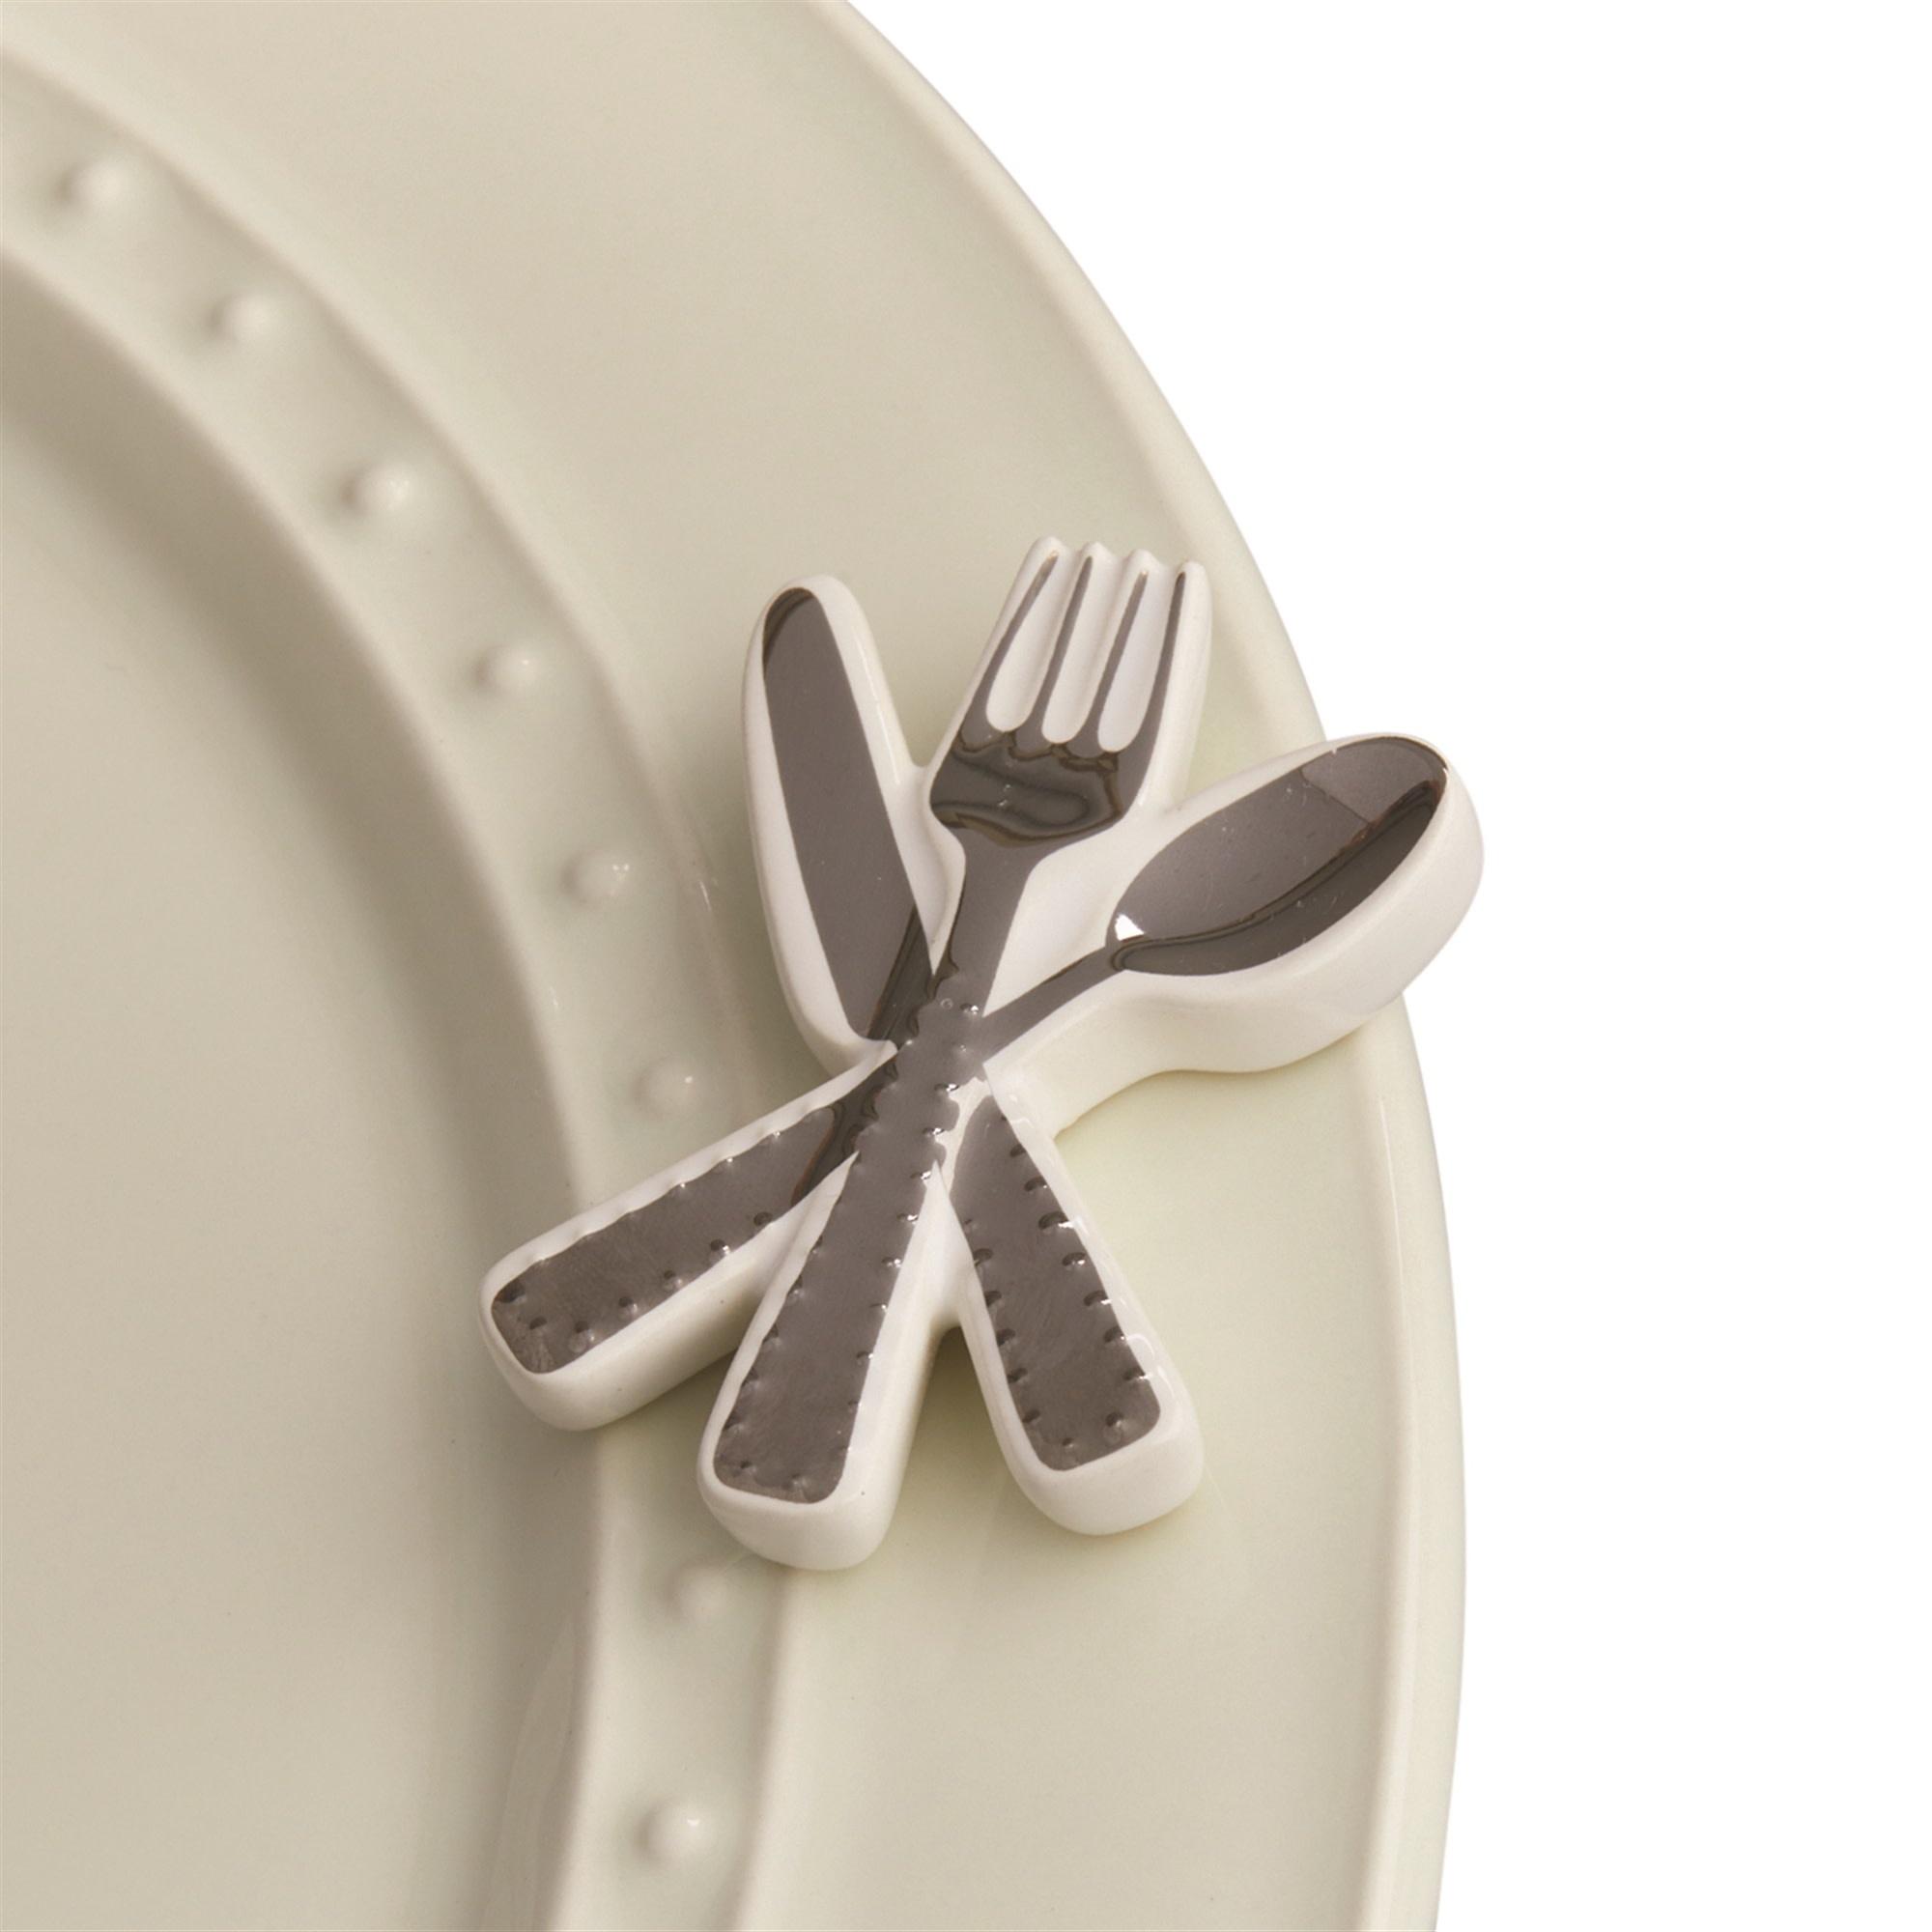 nora fleming bon appetit mini (flatware/silverware)